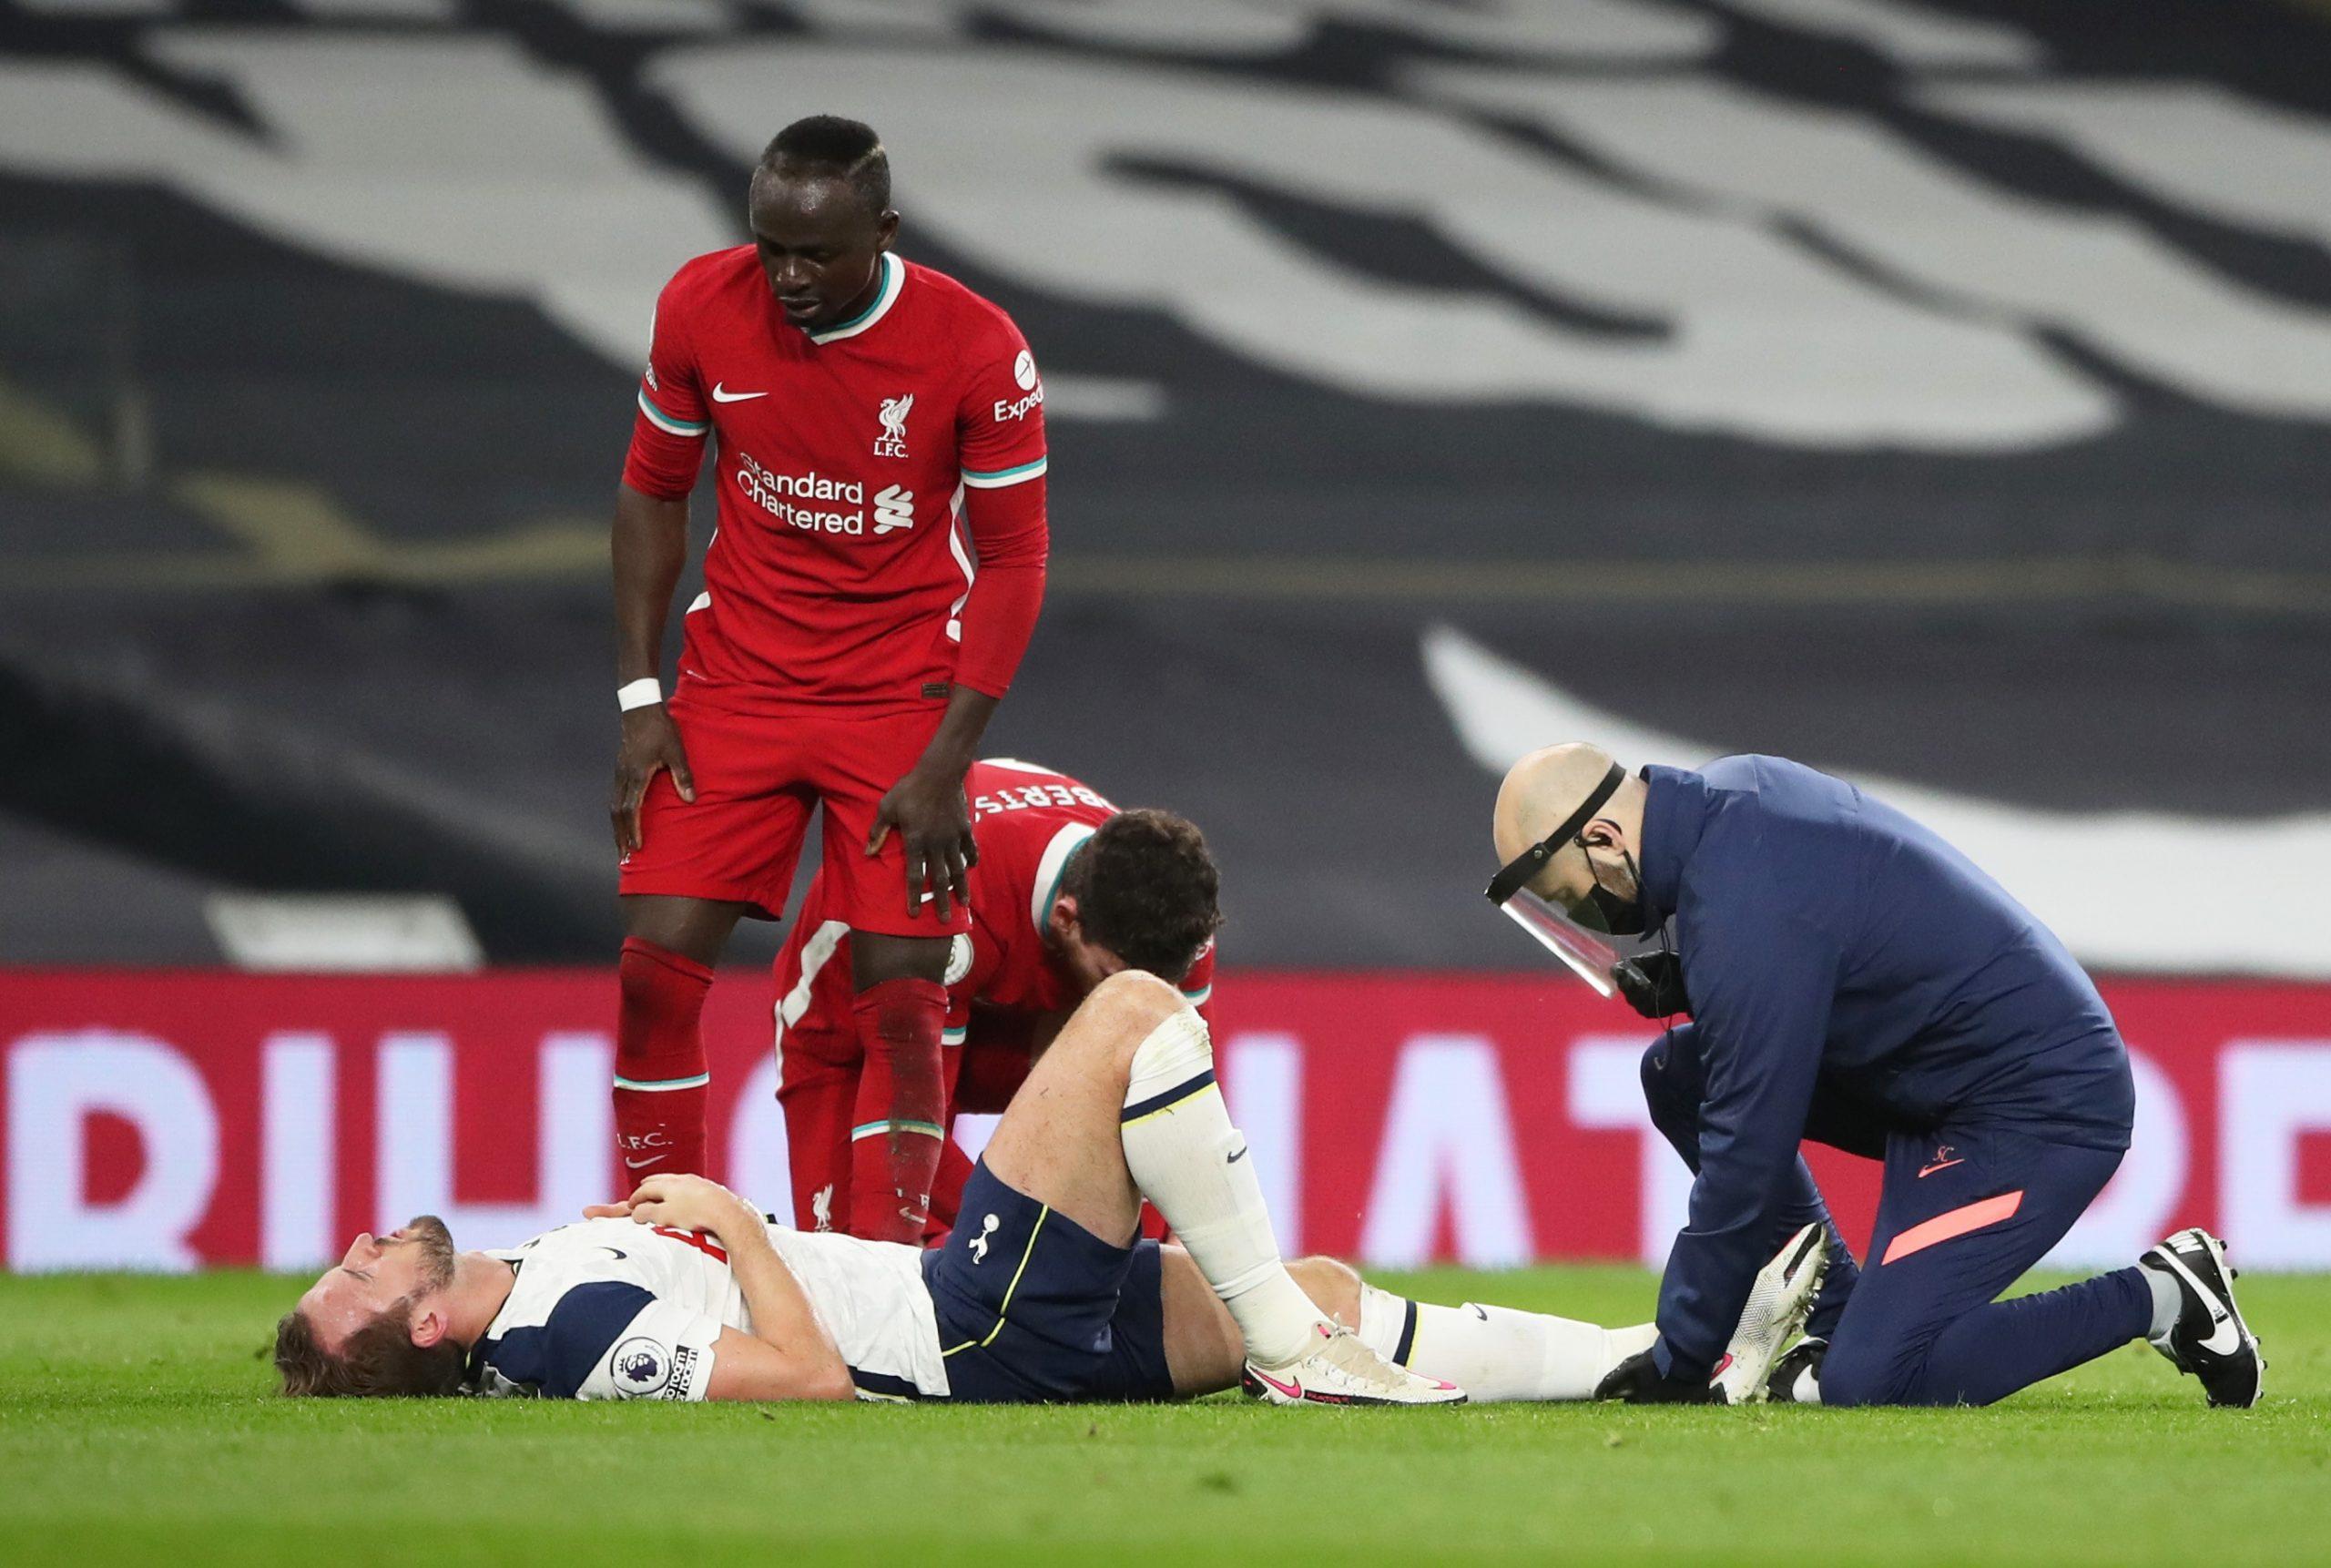 Tottenham's Harry Kane injured